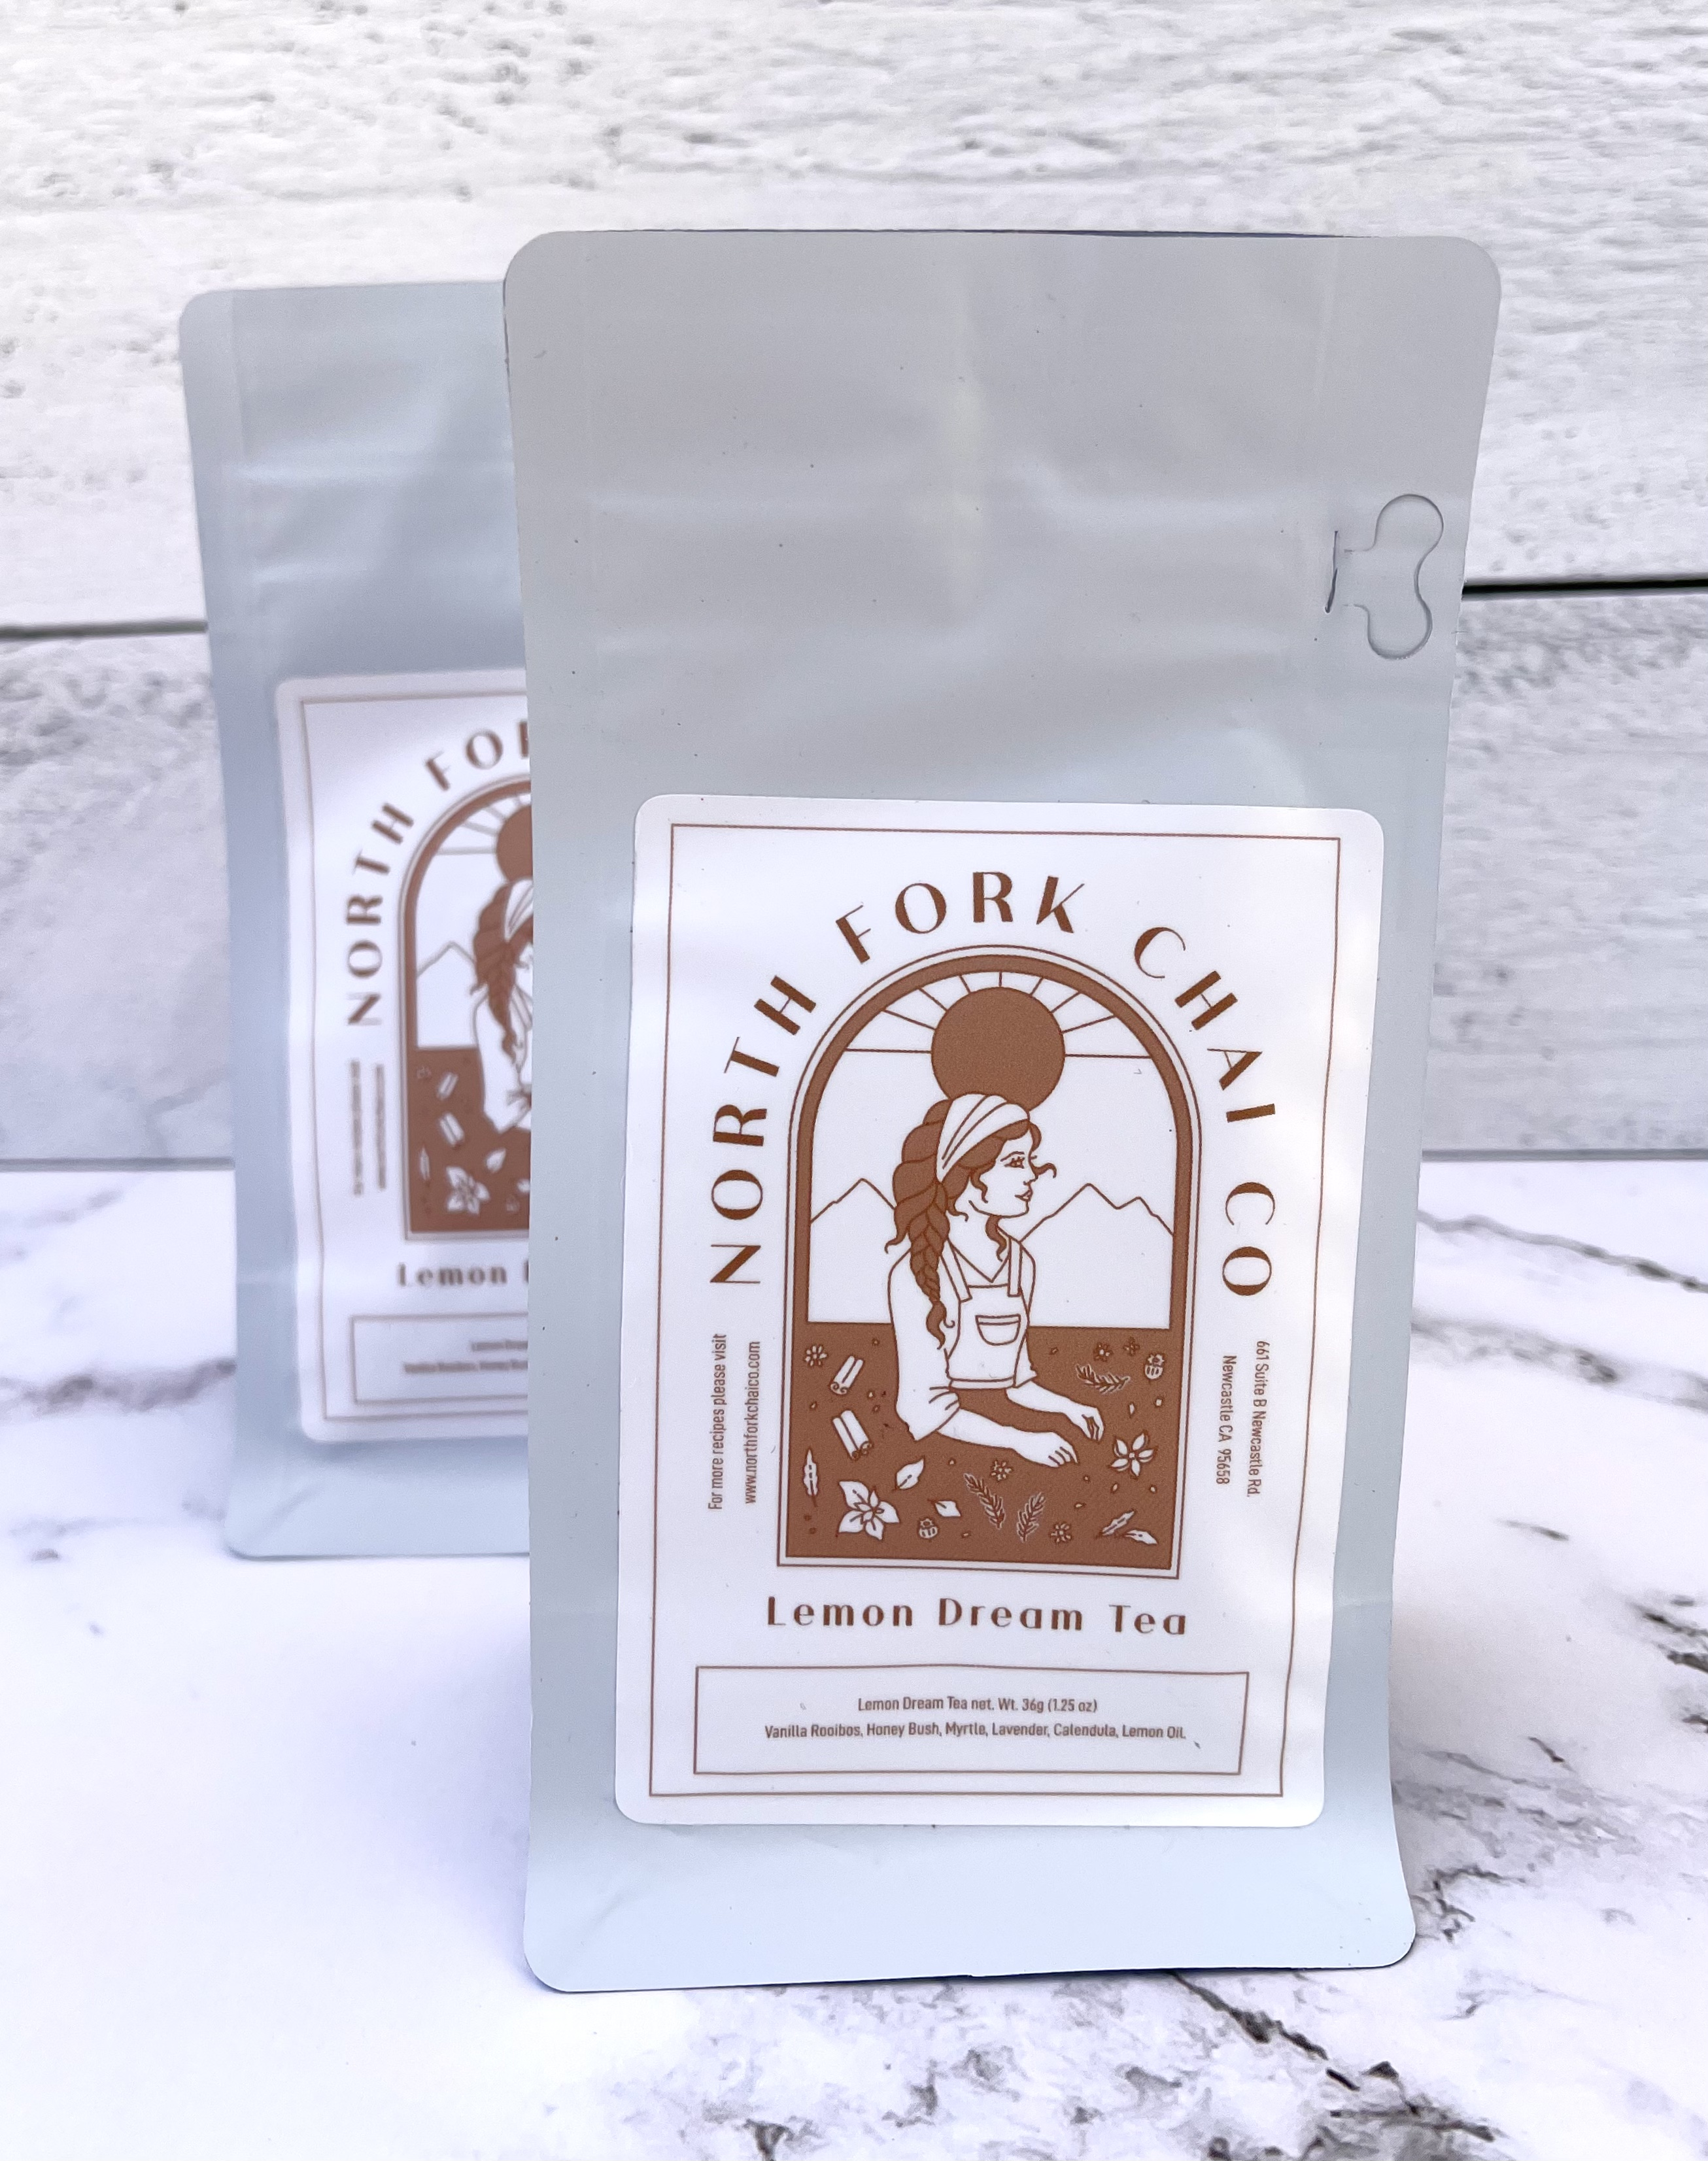 North Fork Chai Co. Lemon Dream Tea